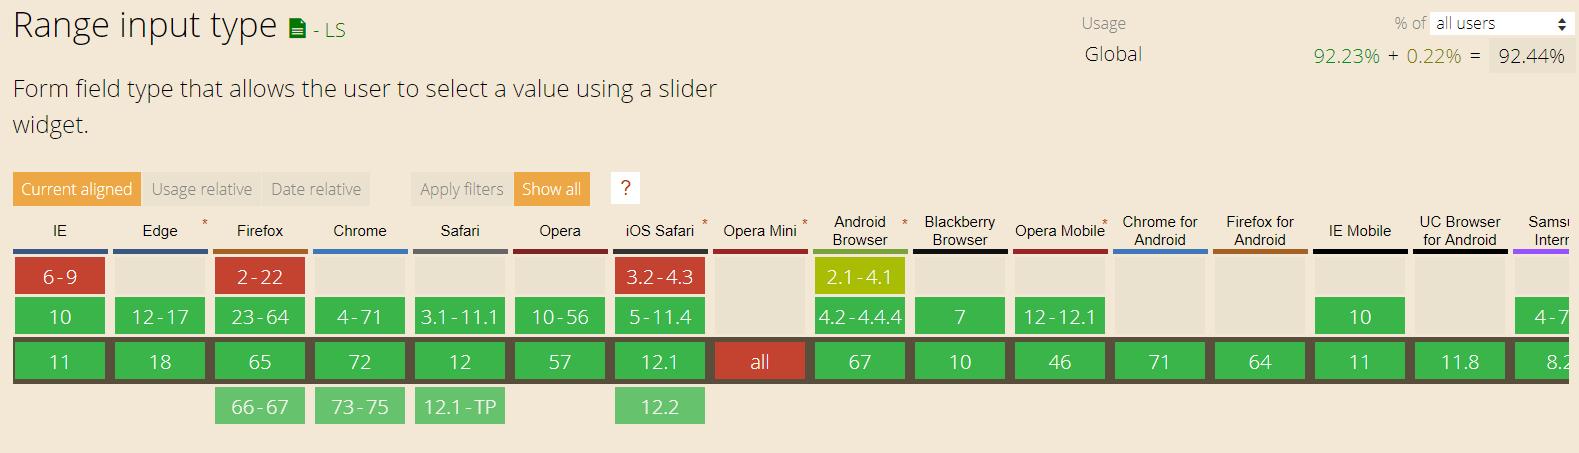 range input type